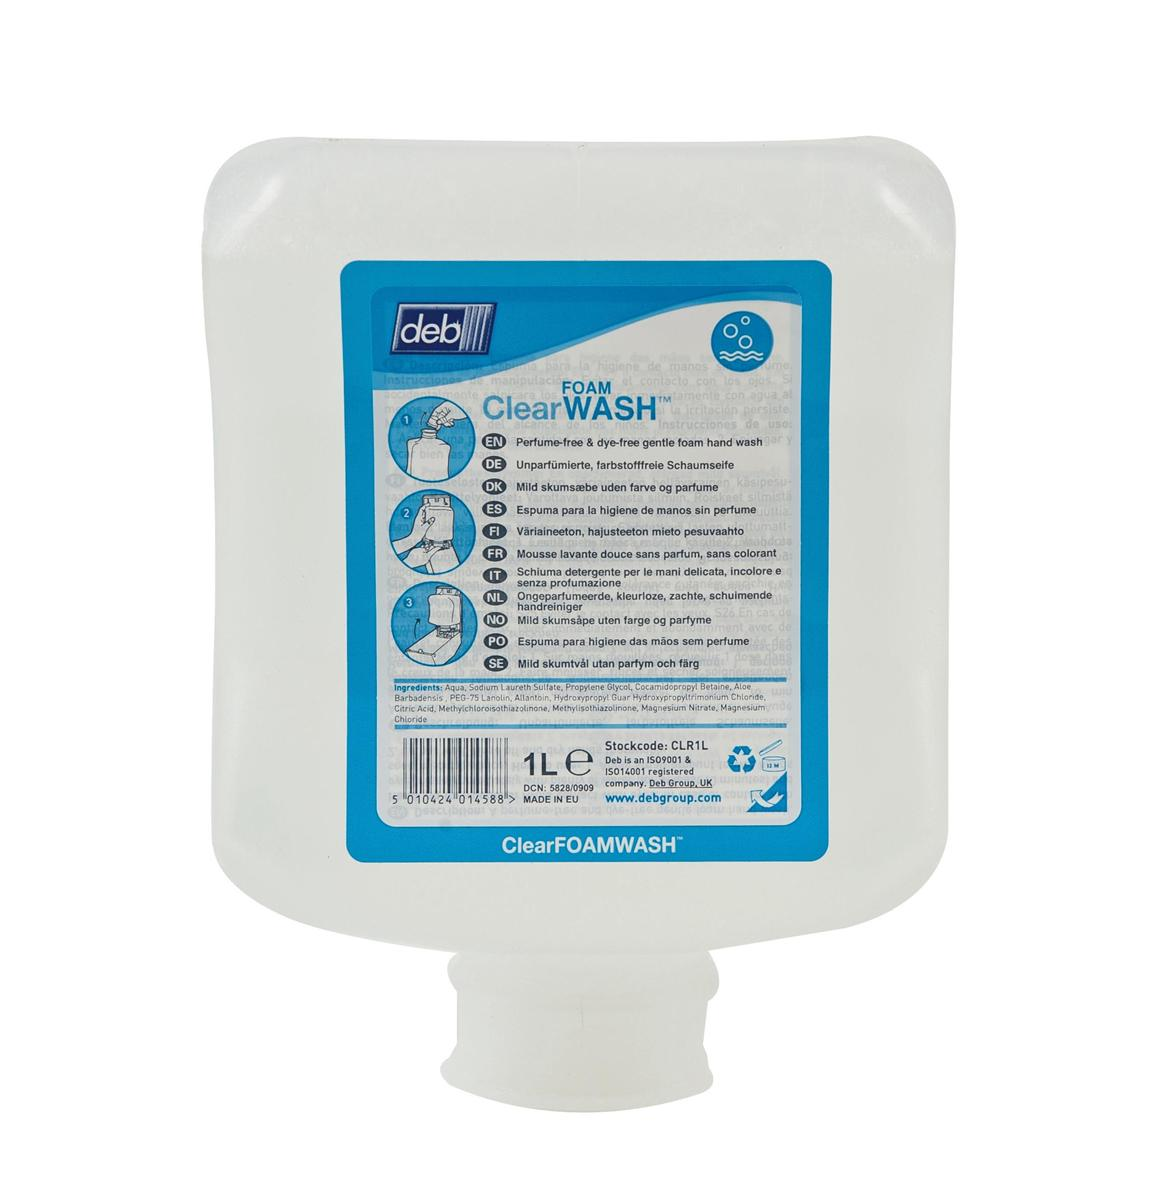 DEB Clear Foaming Hand Soap Refill Cartridge 1 Litre Ref N03869